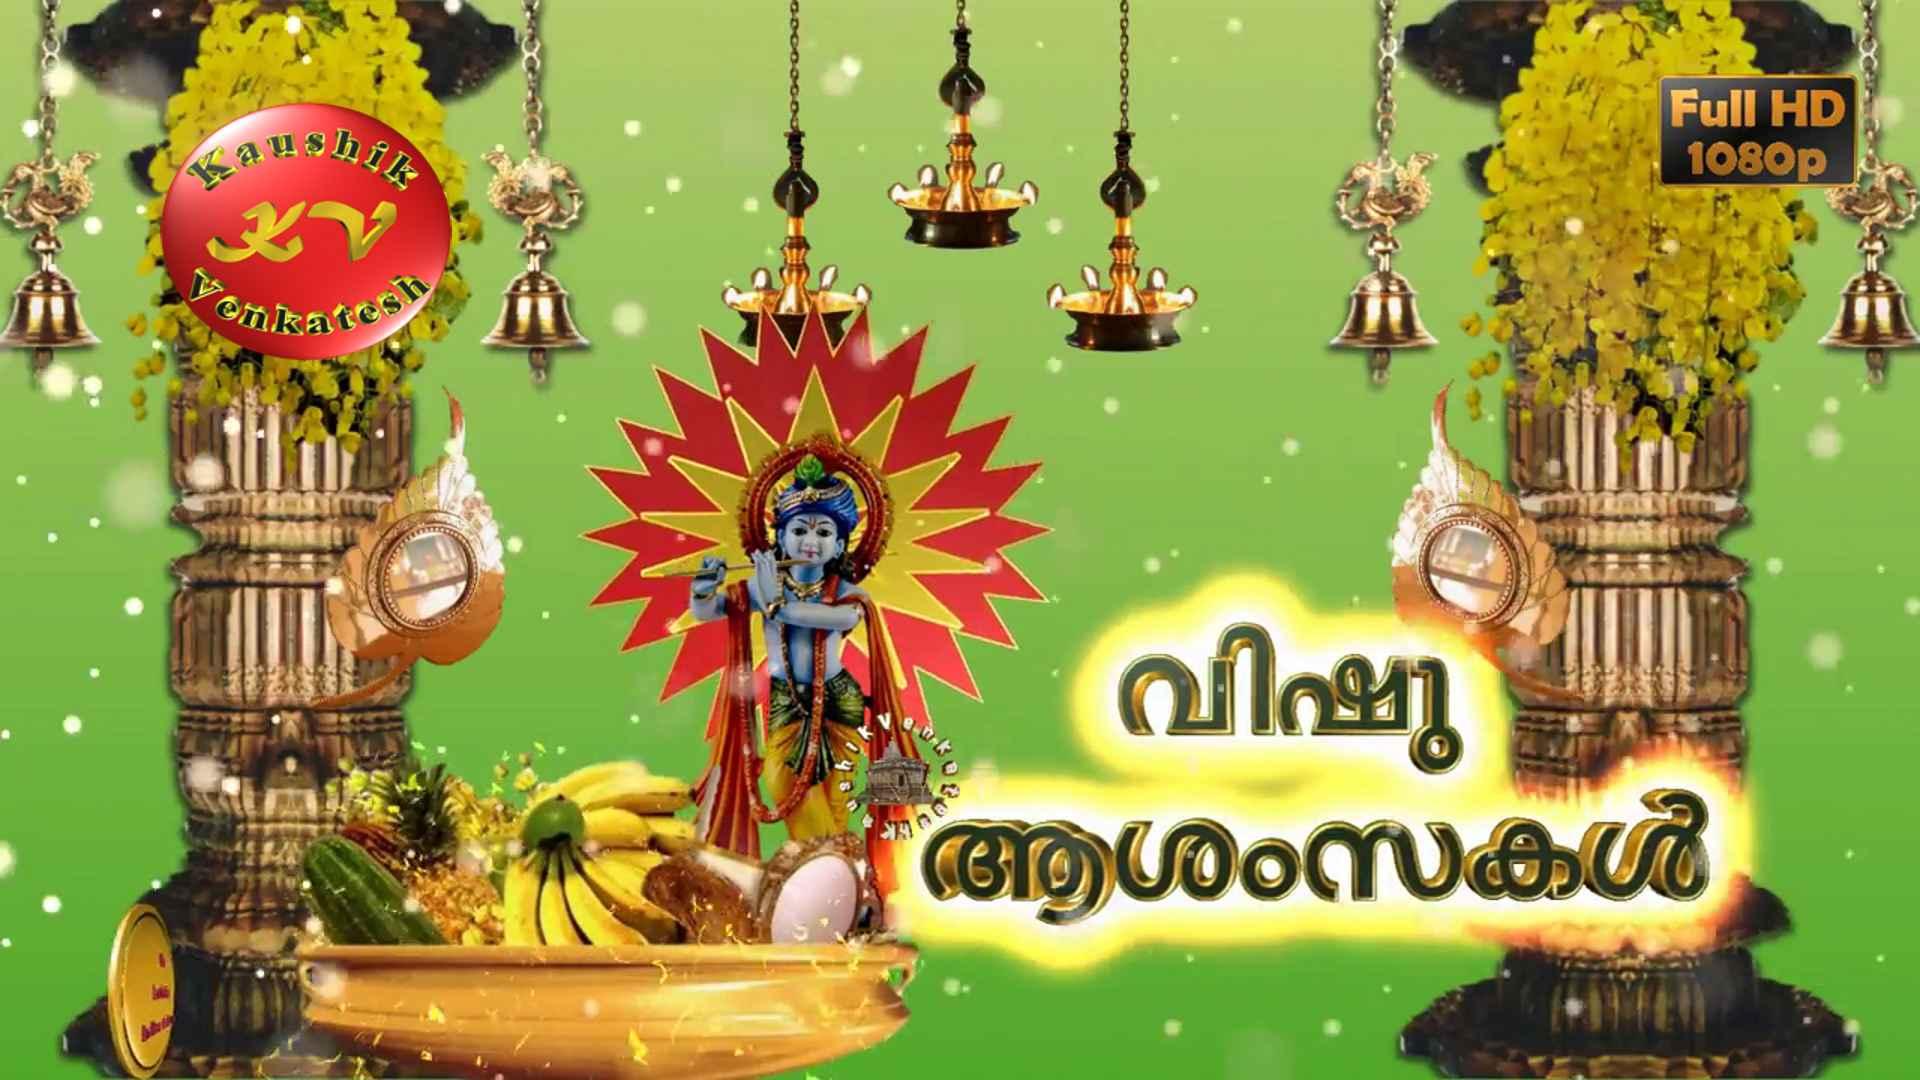 Vishu Wishes in Malayalam